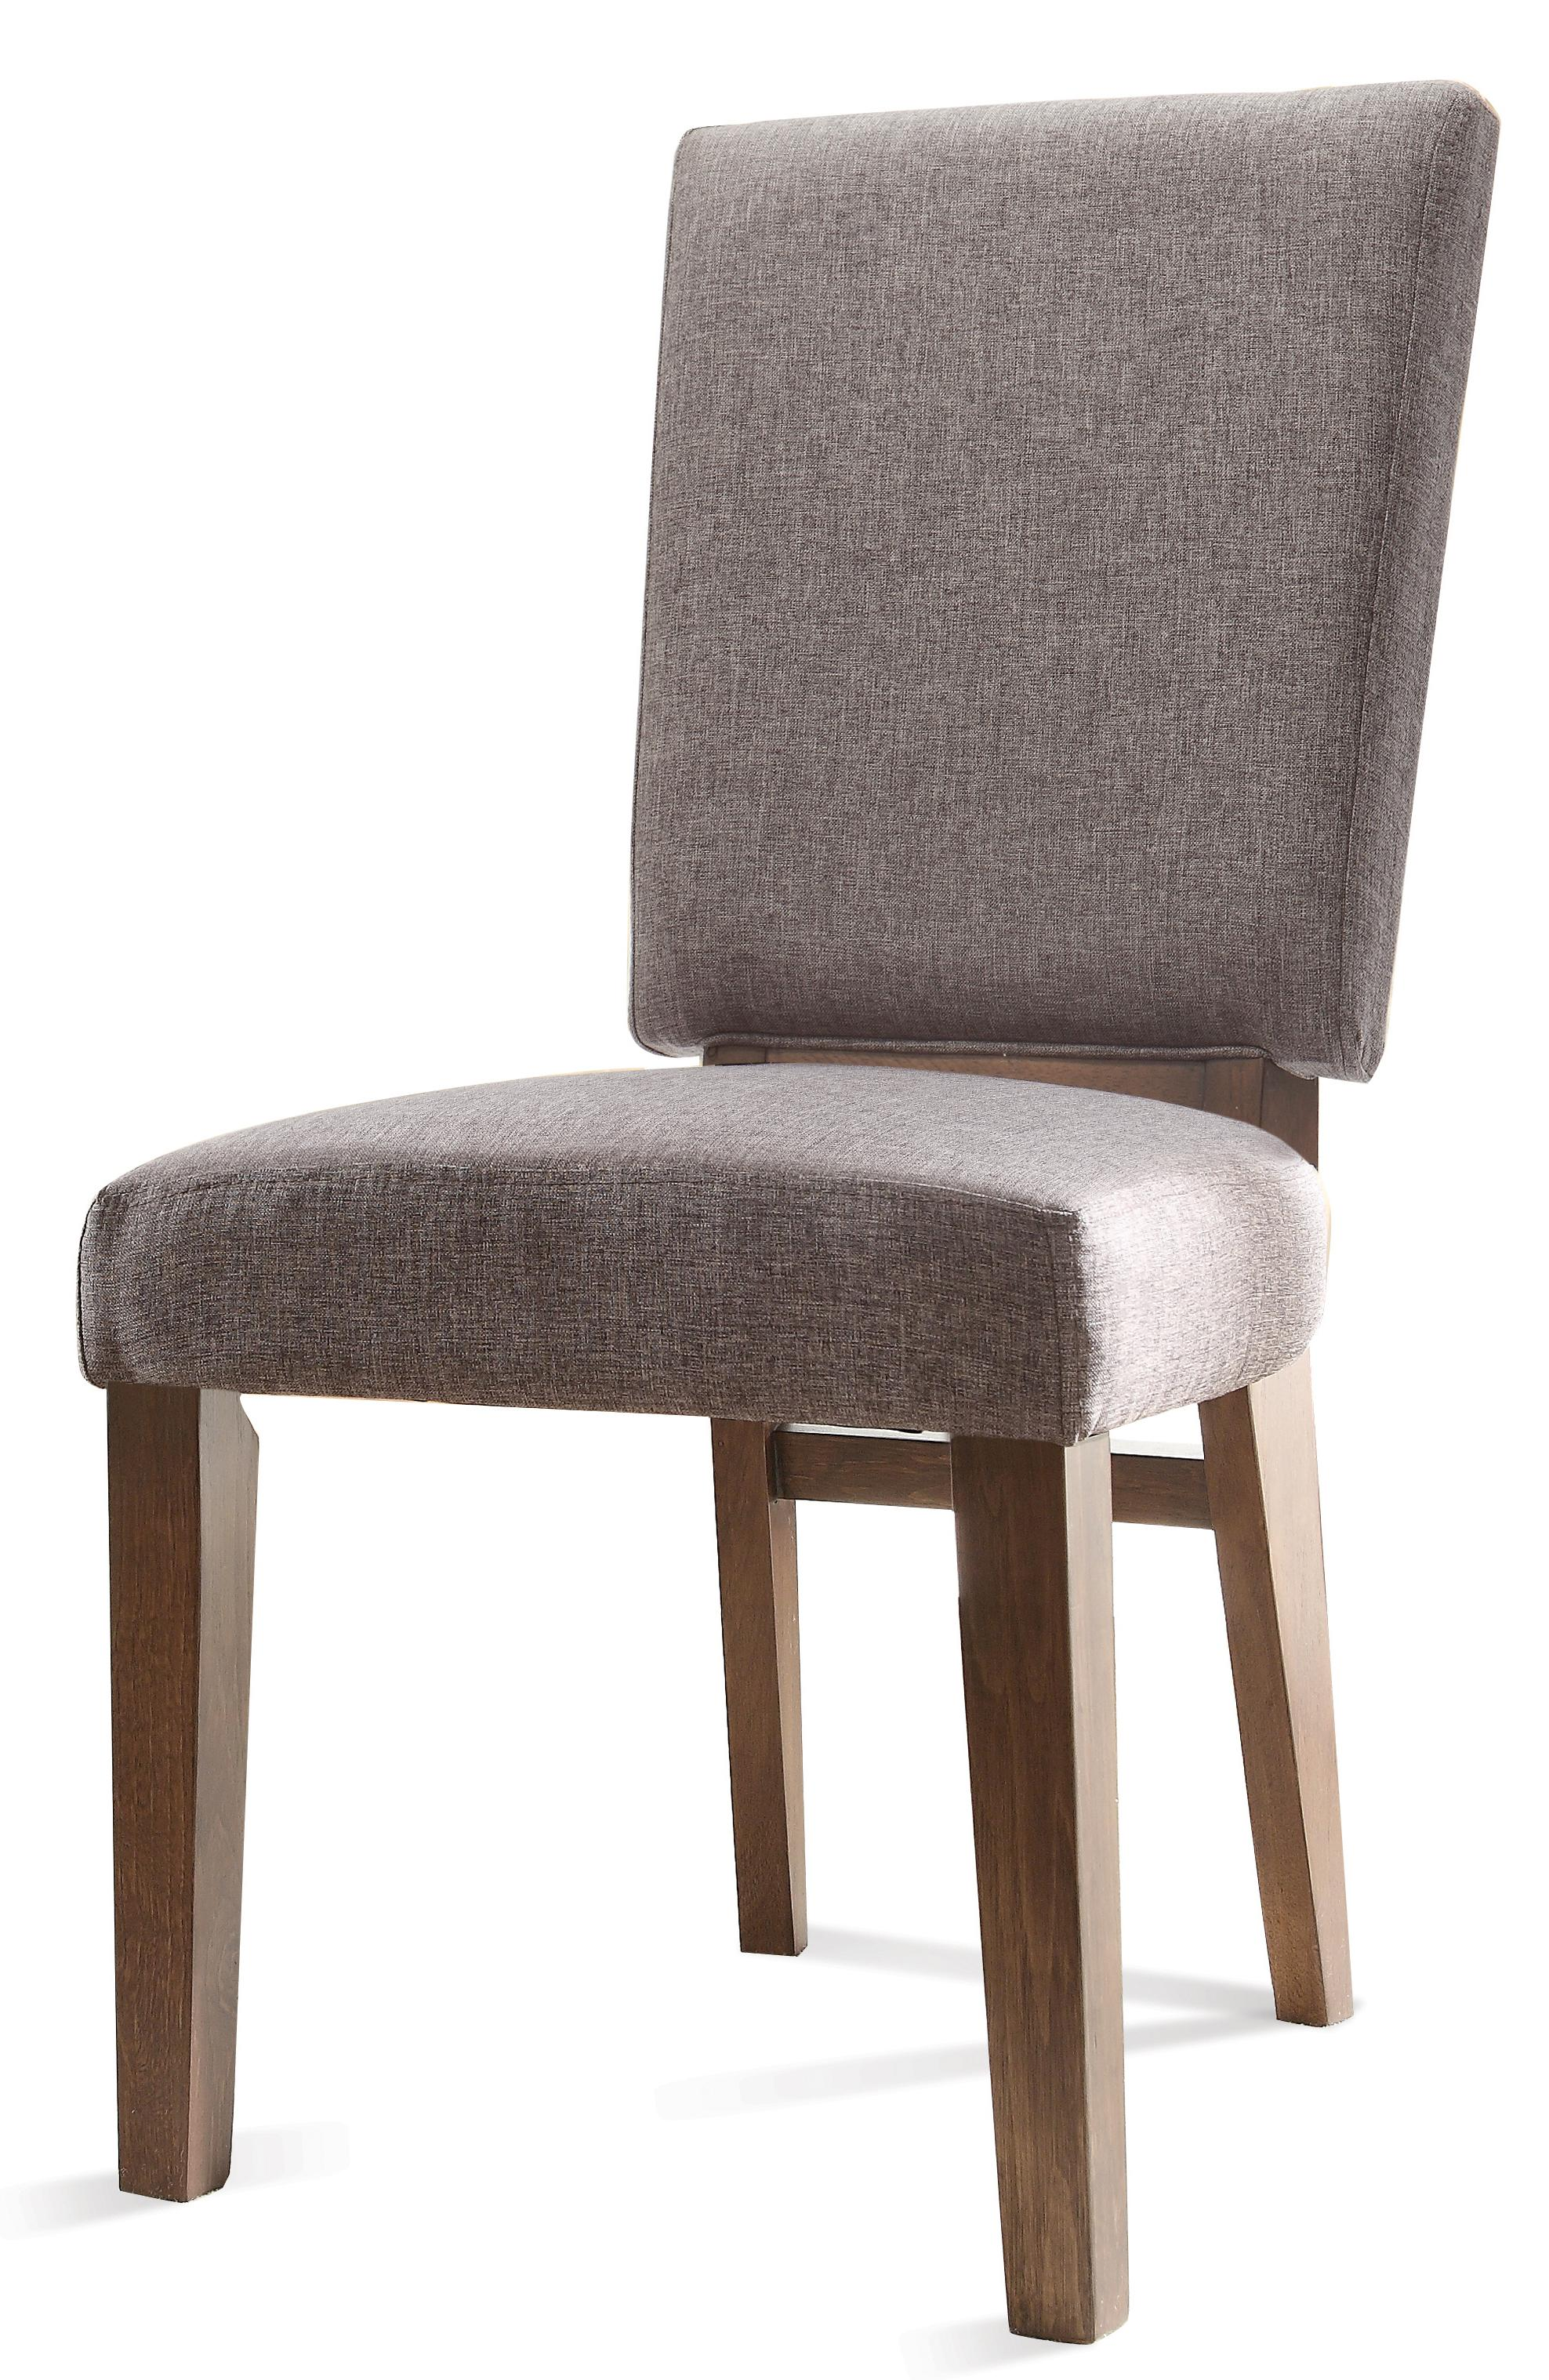 Terra Vista 7 PC Table & Chair Set by Riverside Furniture